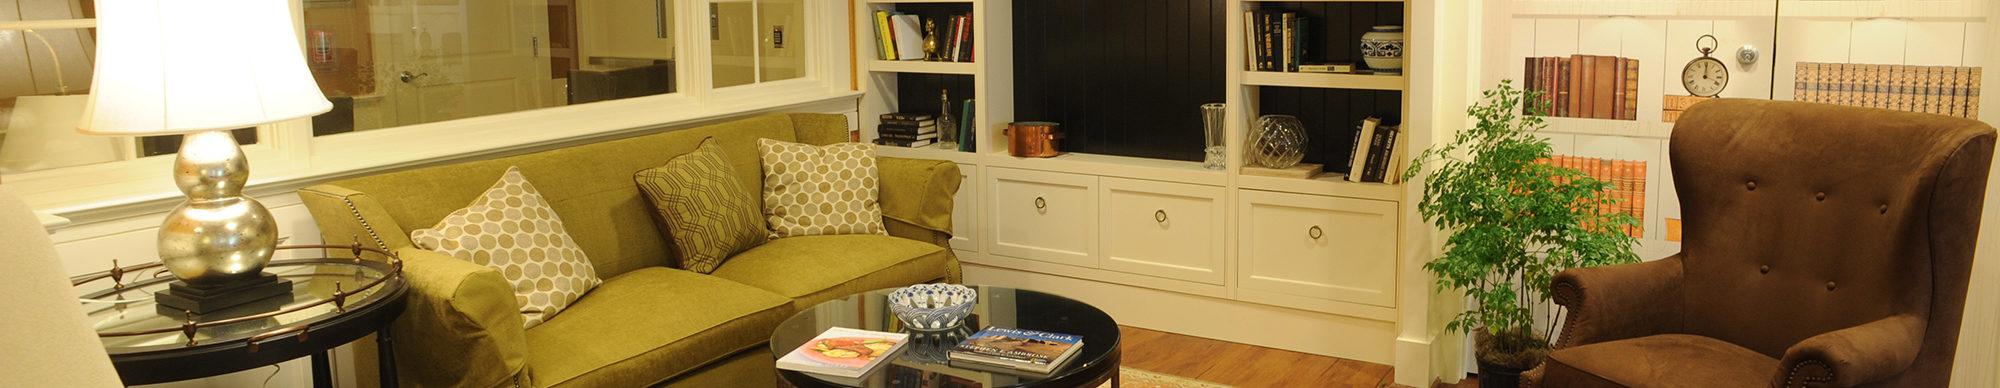 Senior Living Area